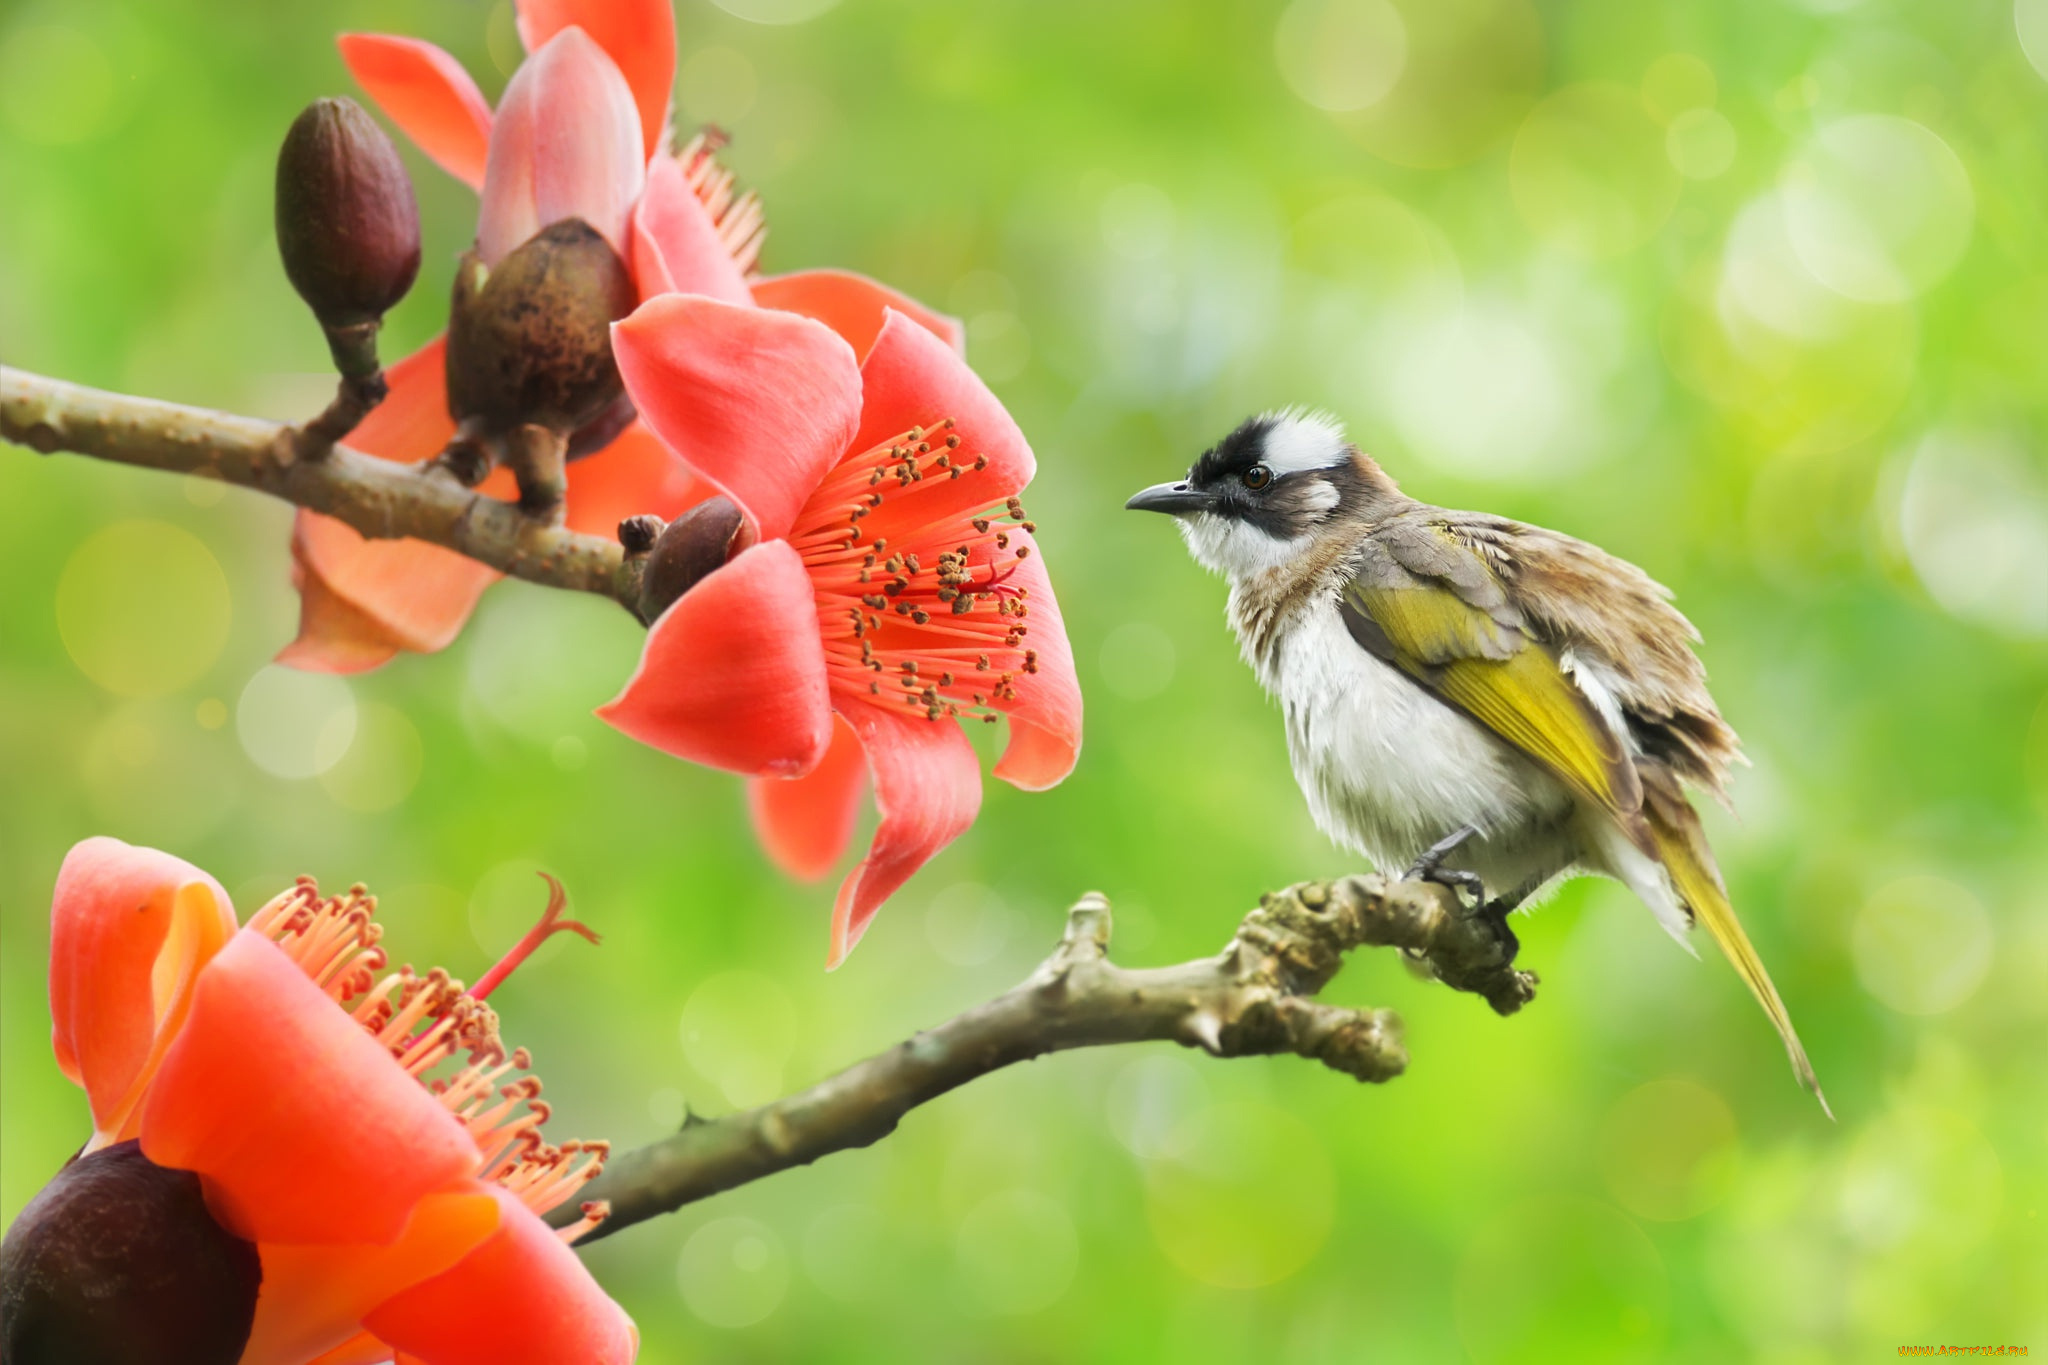 природа птица ветка животное без смс